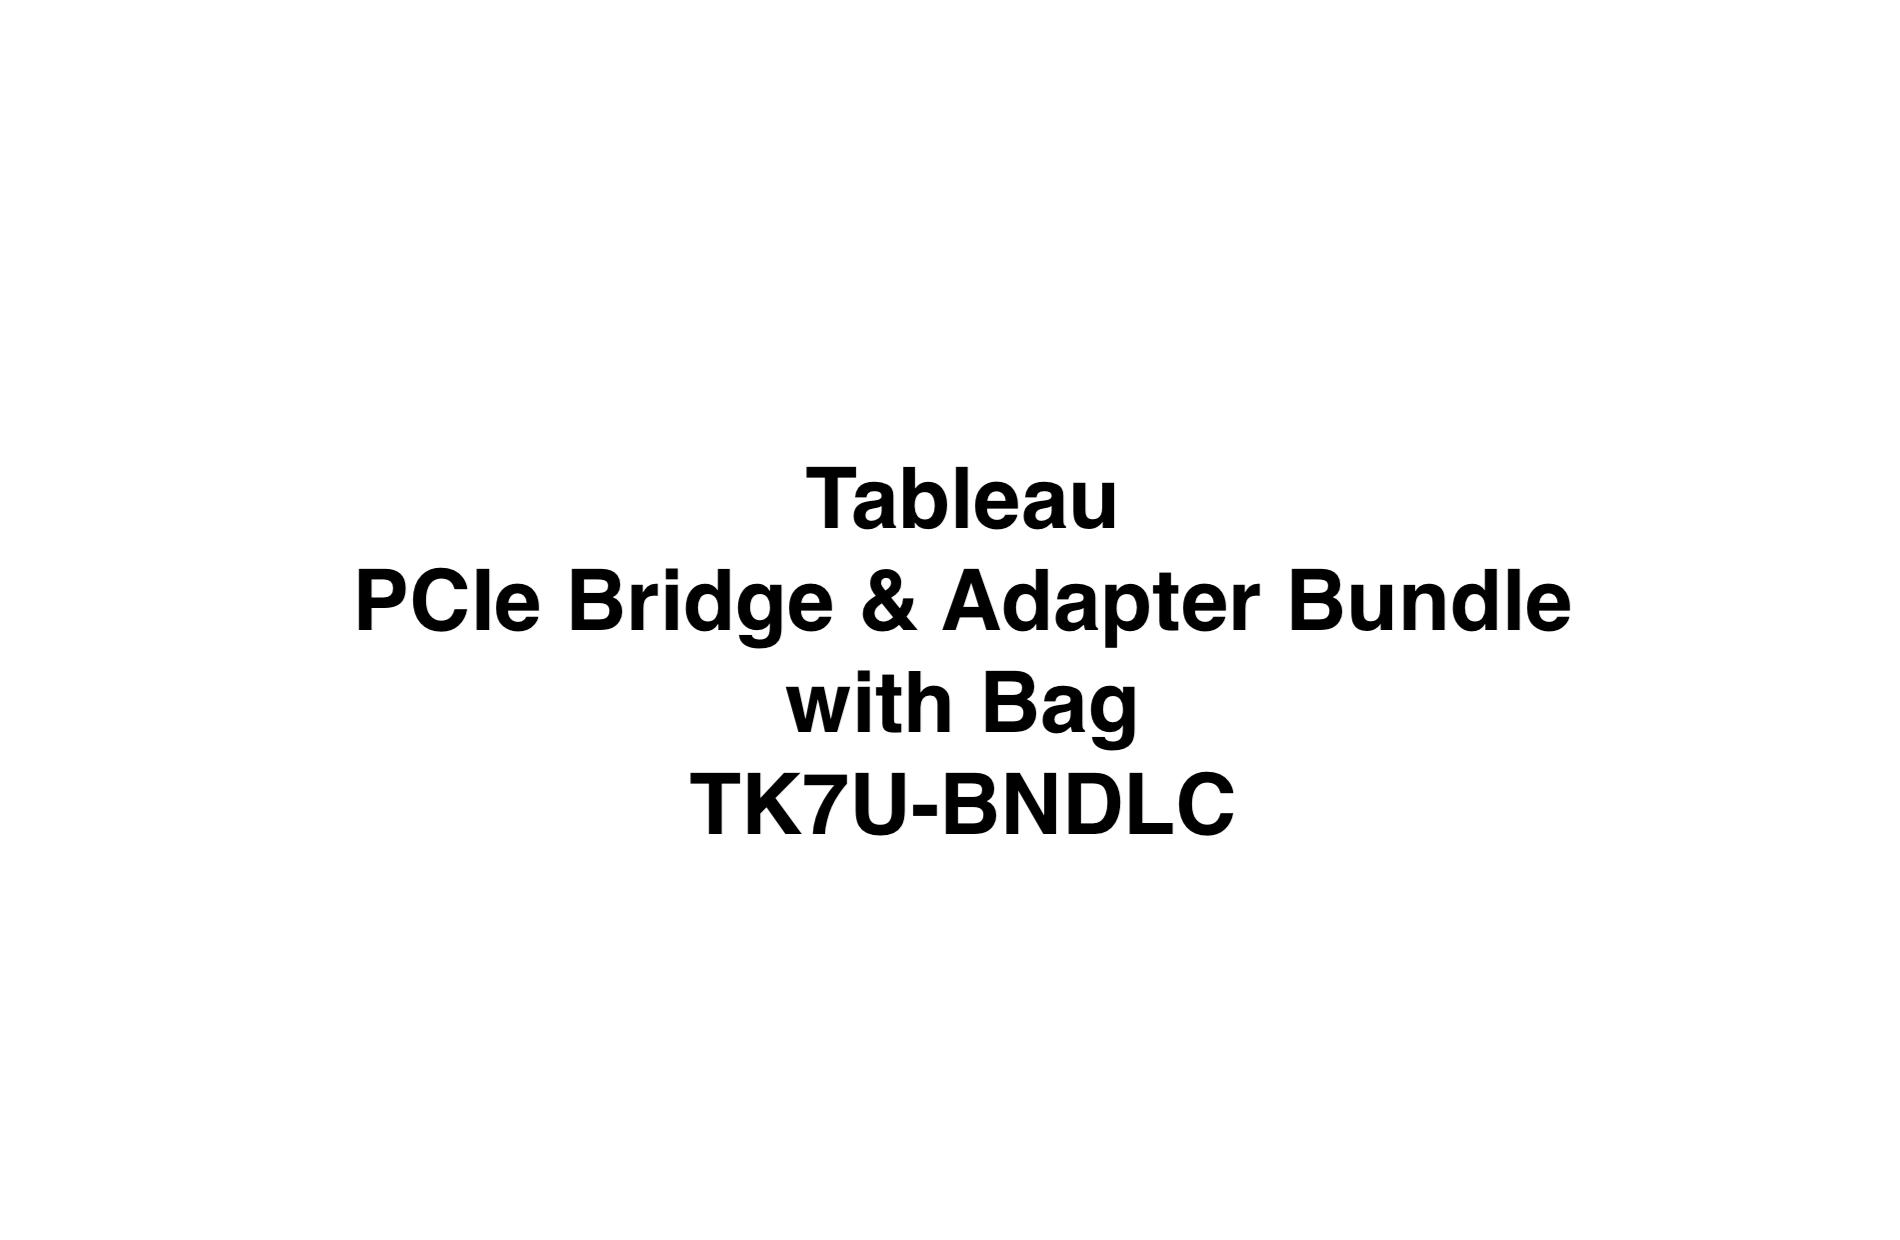 Picture of PCIe Bridge and Adapter Bundle (TK7U-BNDLC)